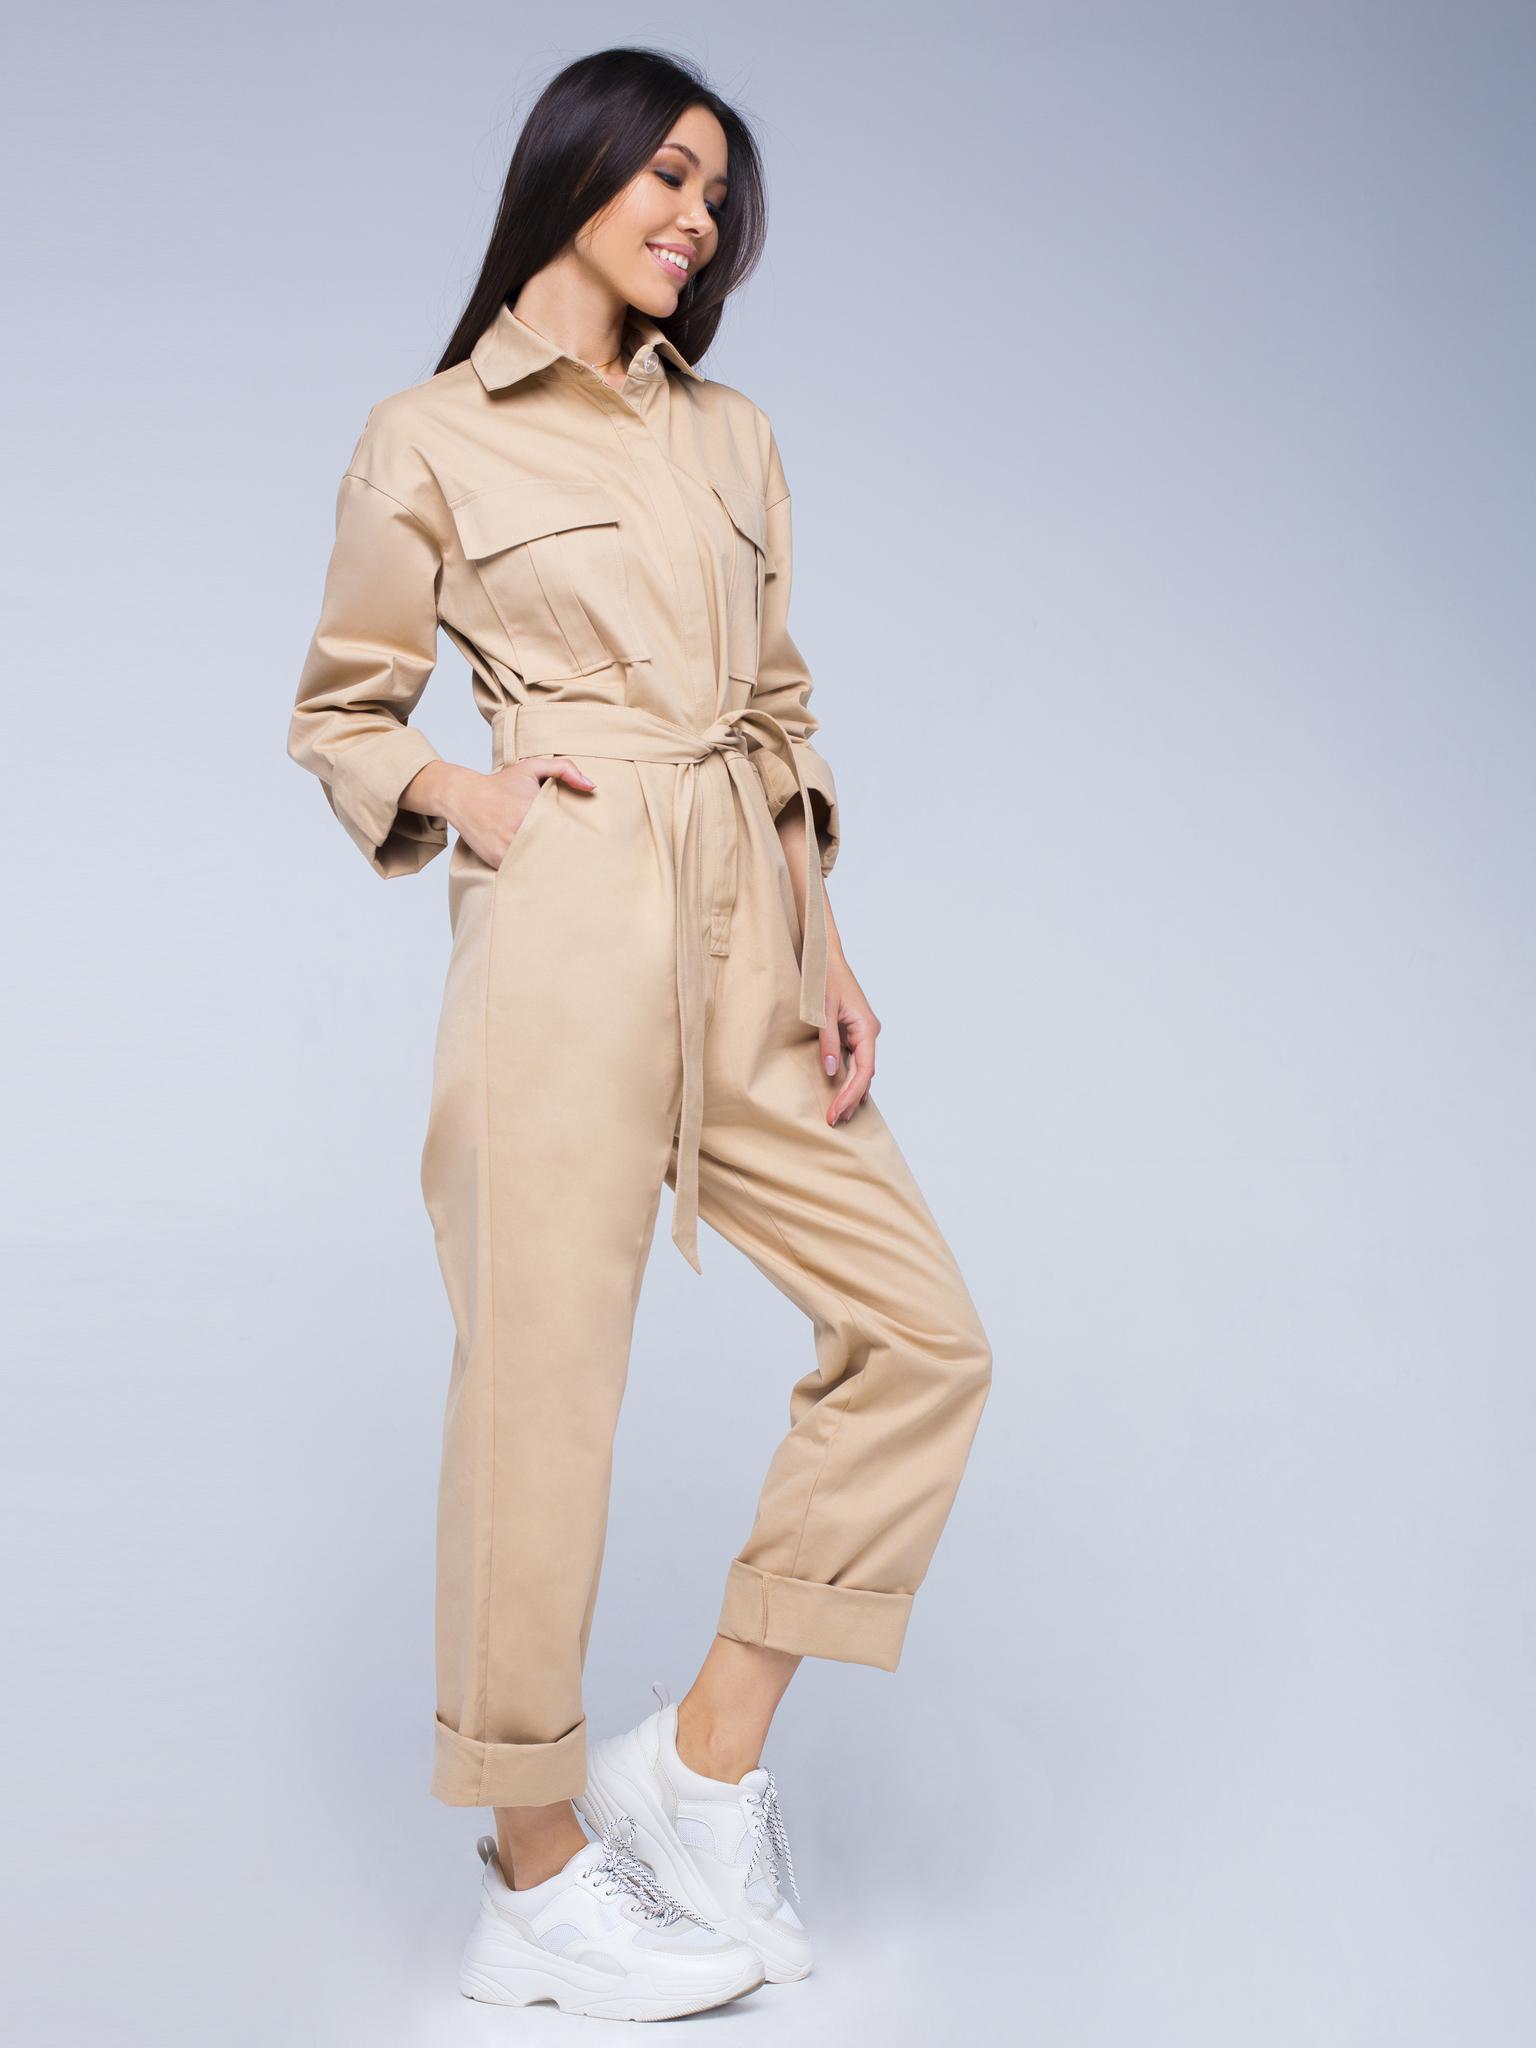 Комбинезон бежевый YOS от украинского бренда Your Own Style